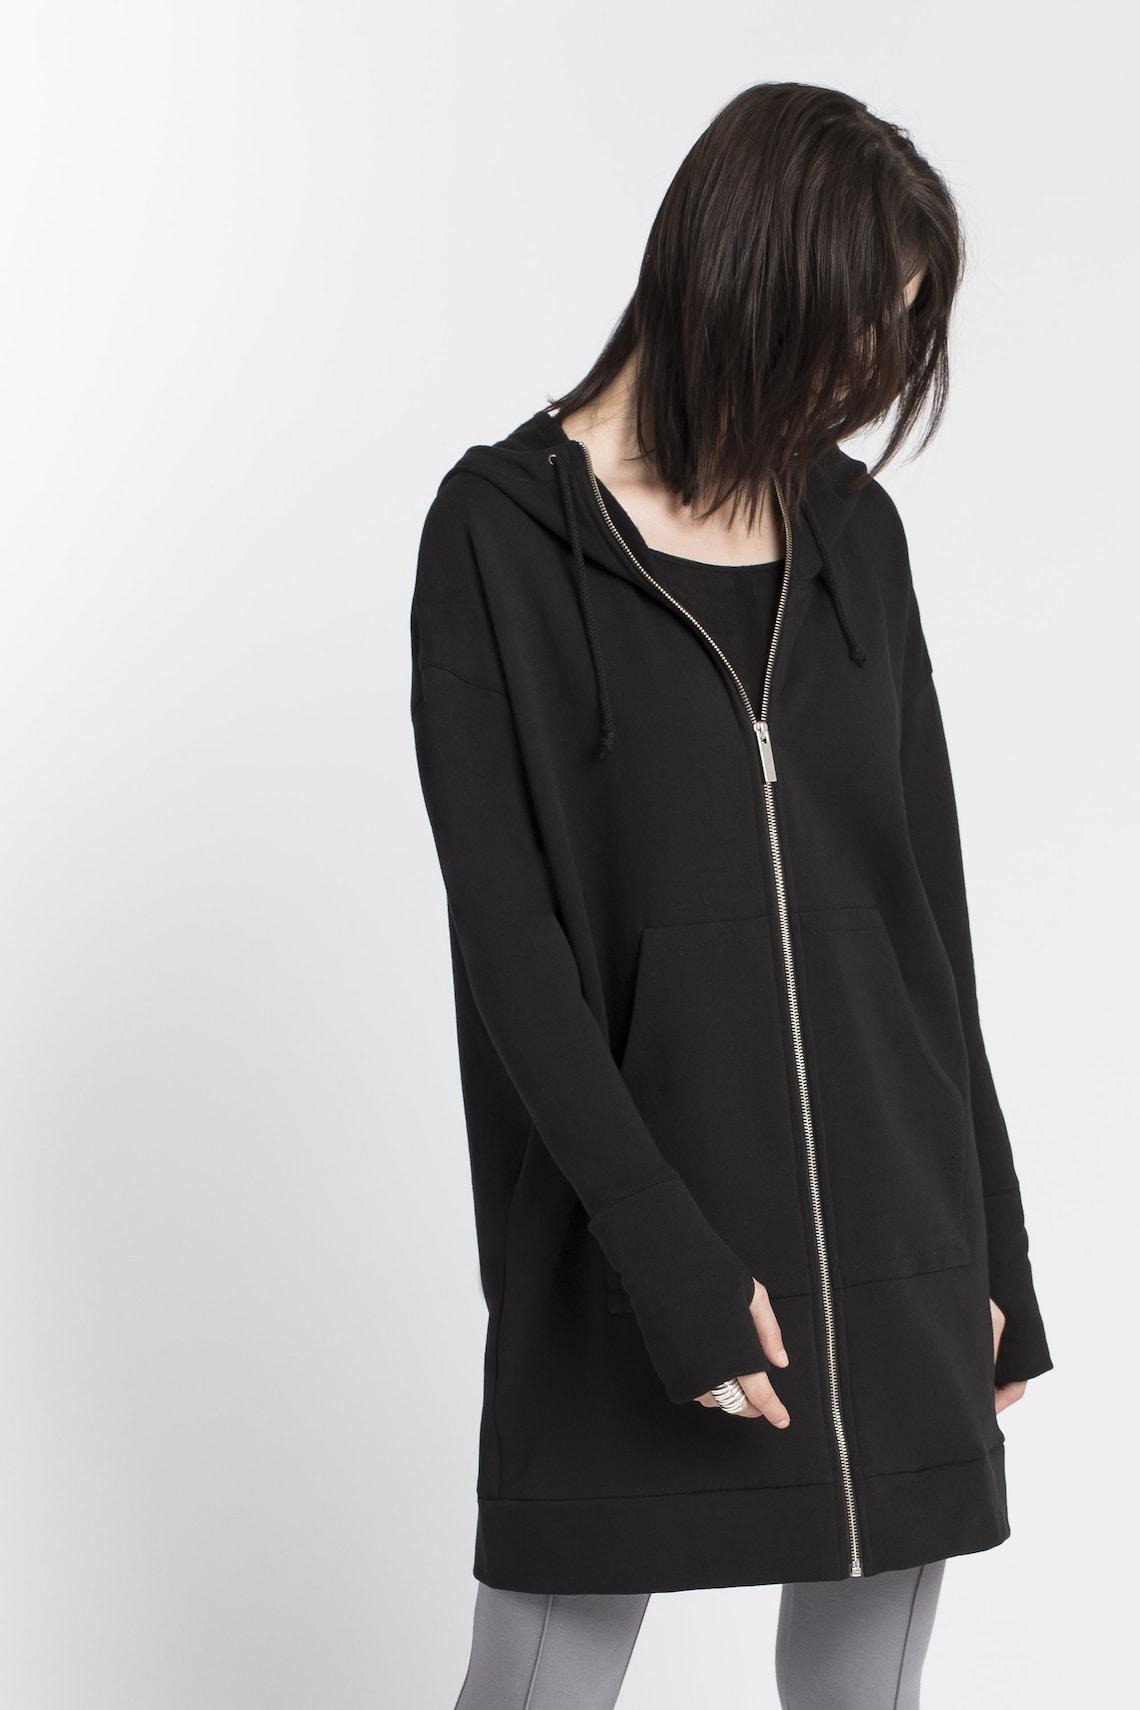 Zip-up Jacket, Pockets Hoodie Sweatshirt, Oversized Zippered, Remi Zippered Hoodie, Marcellamoda - Mc1378